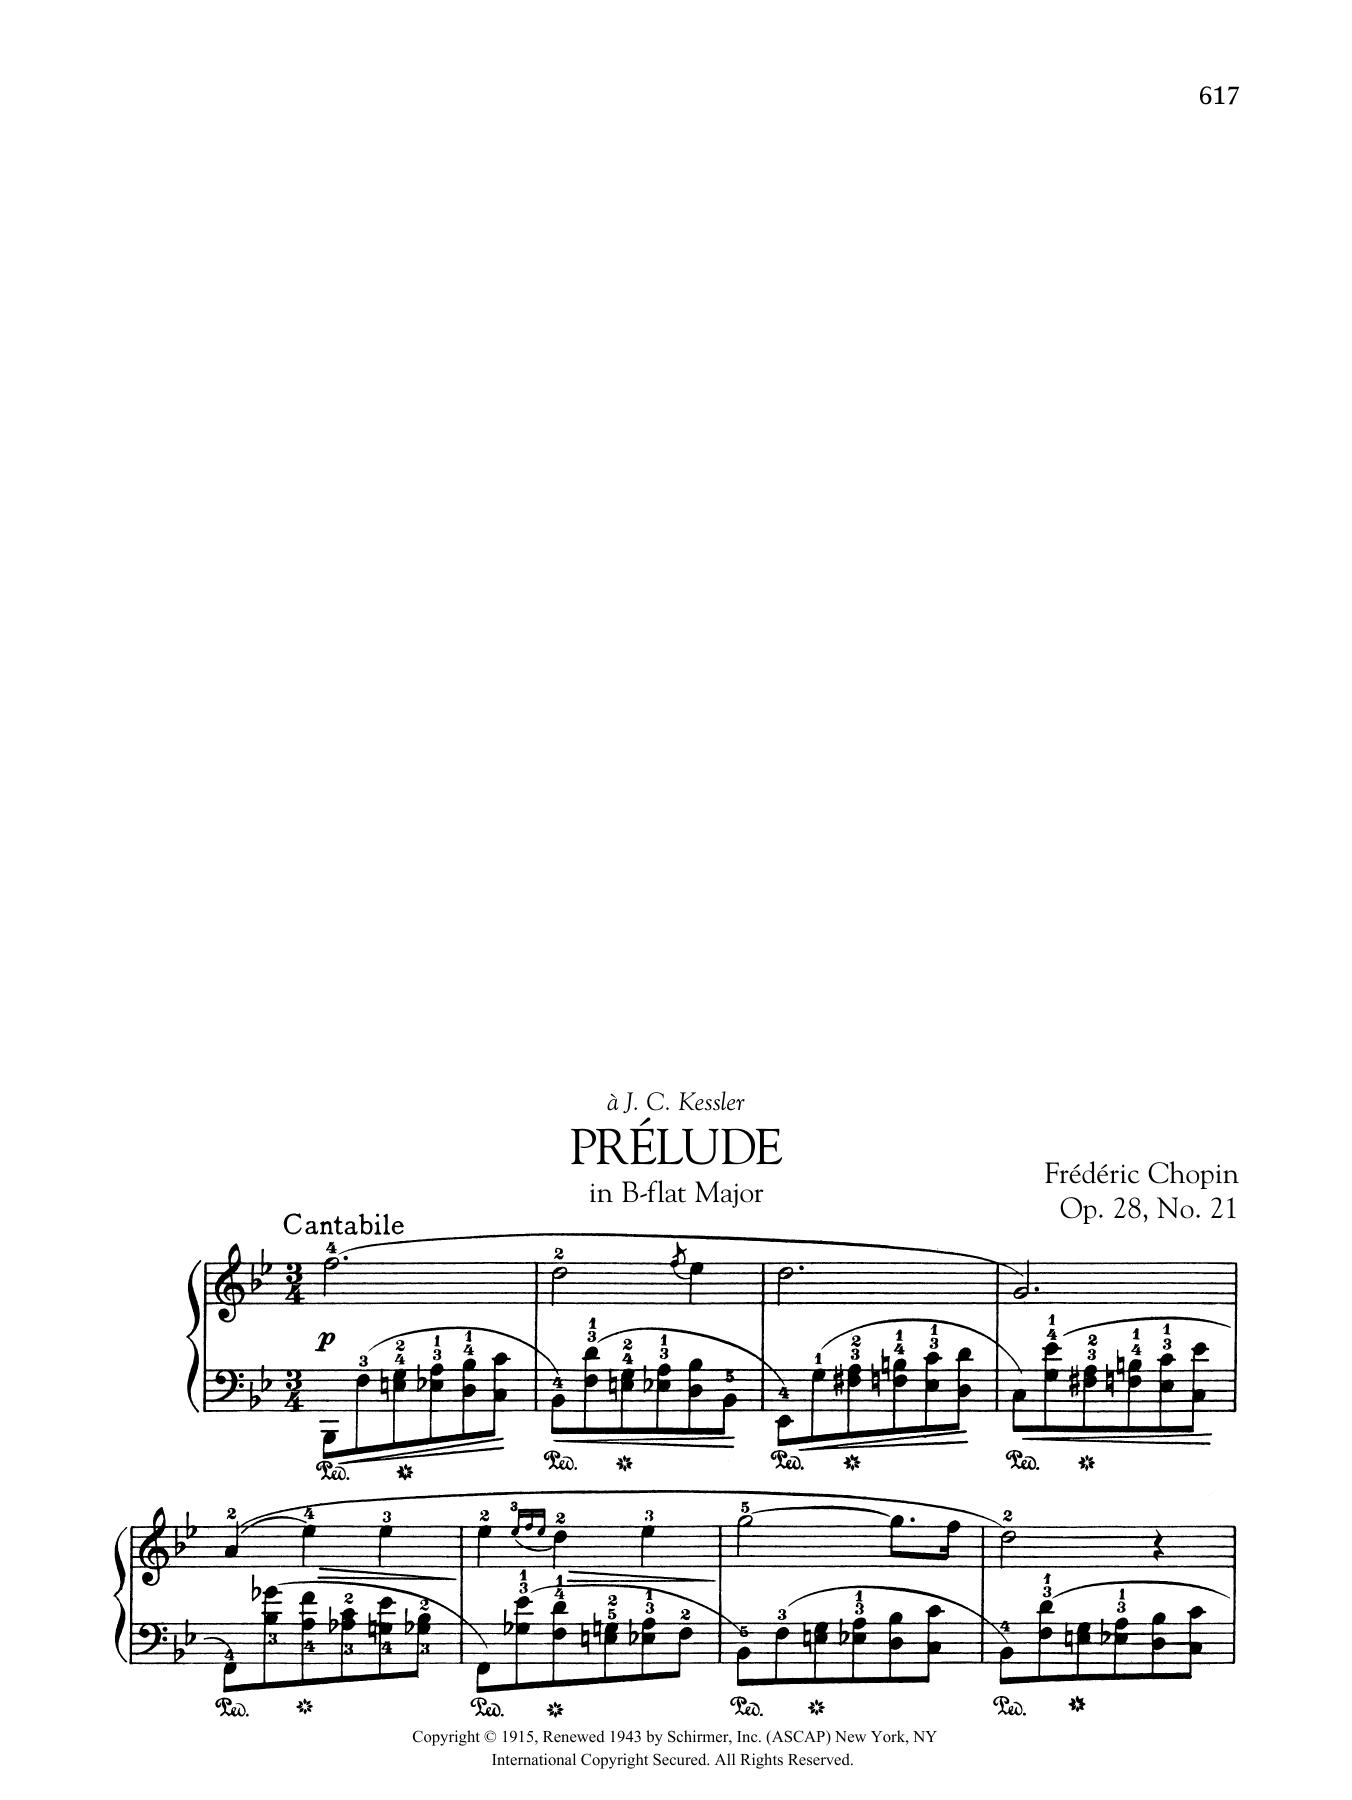 Prélude in B-flat Major, Op. 28, No. 21 Sheet Music